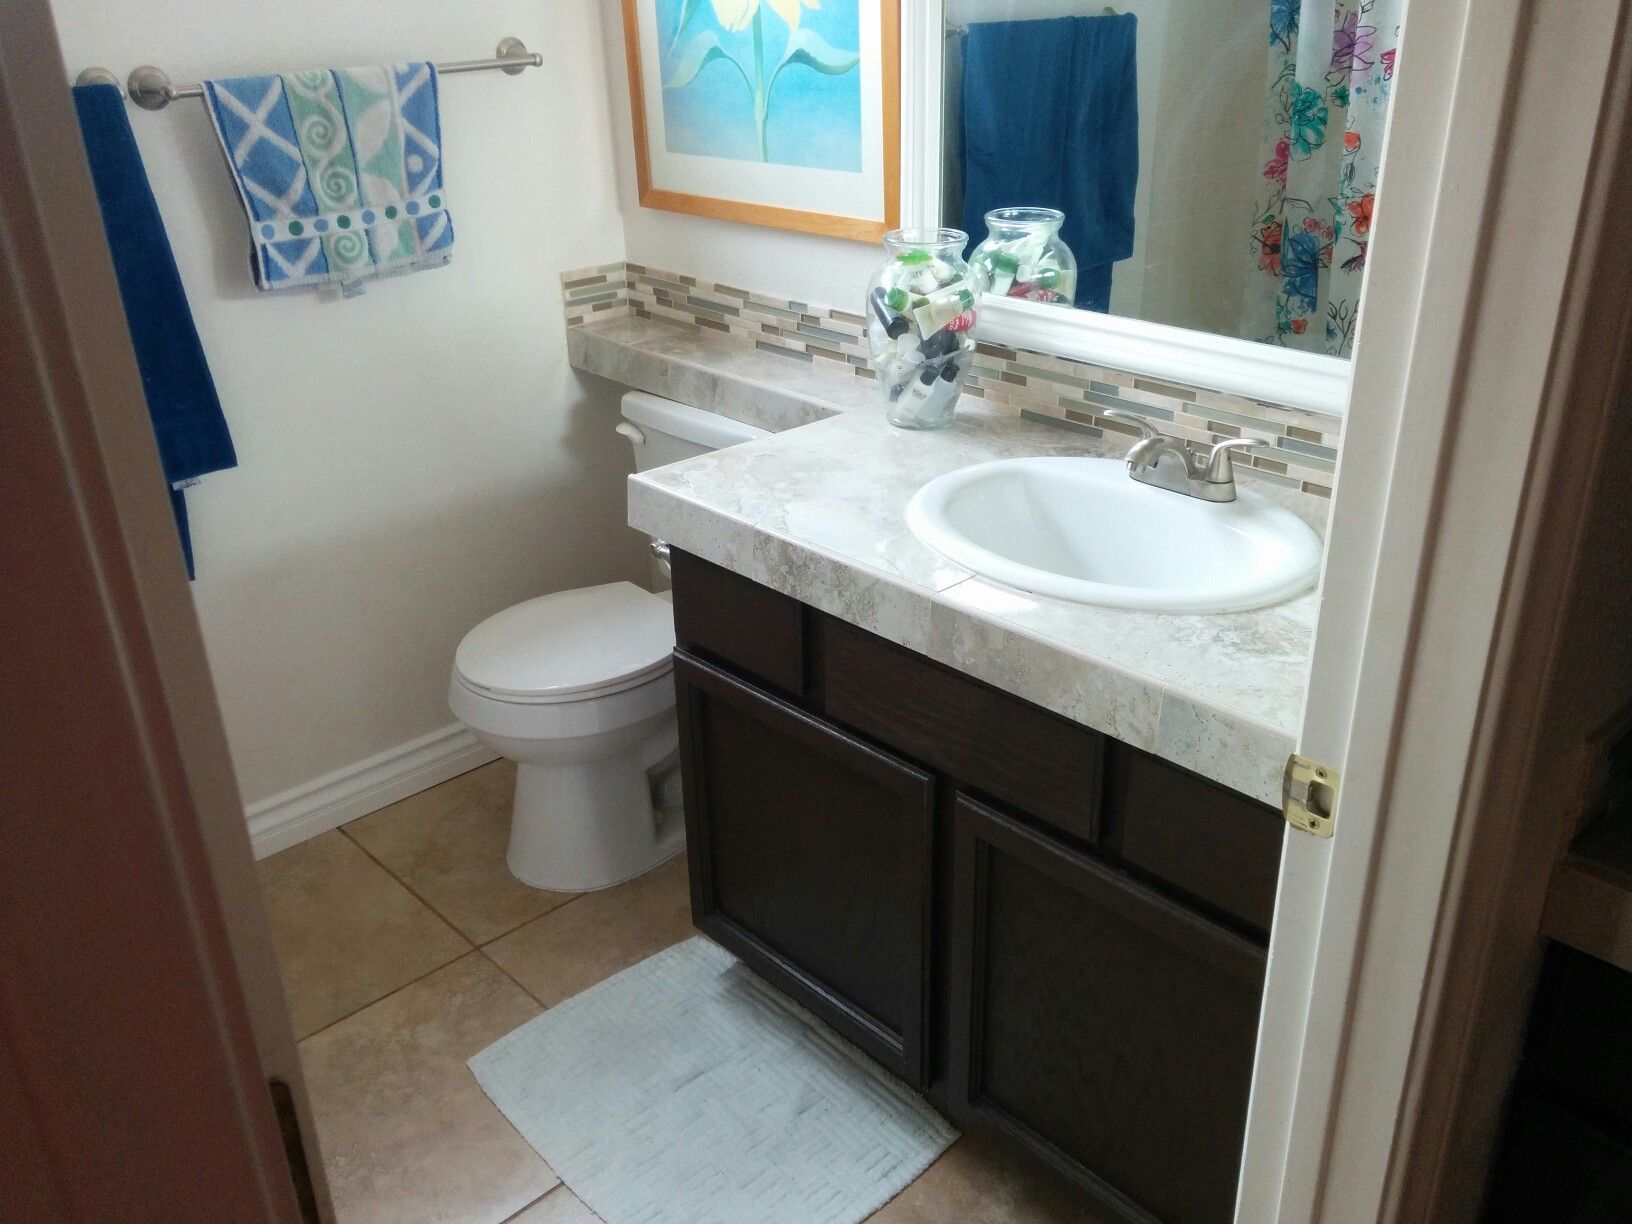 Steves Bathroom Remodeling Contractor We Serve Williamson County - Local bathroom remodeling contractors